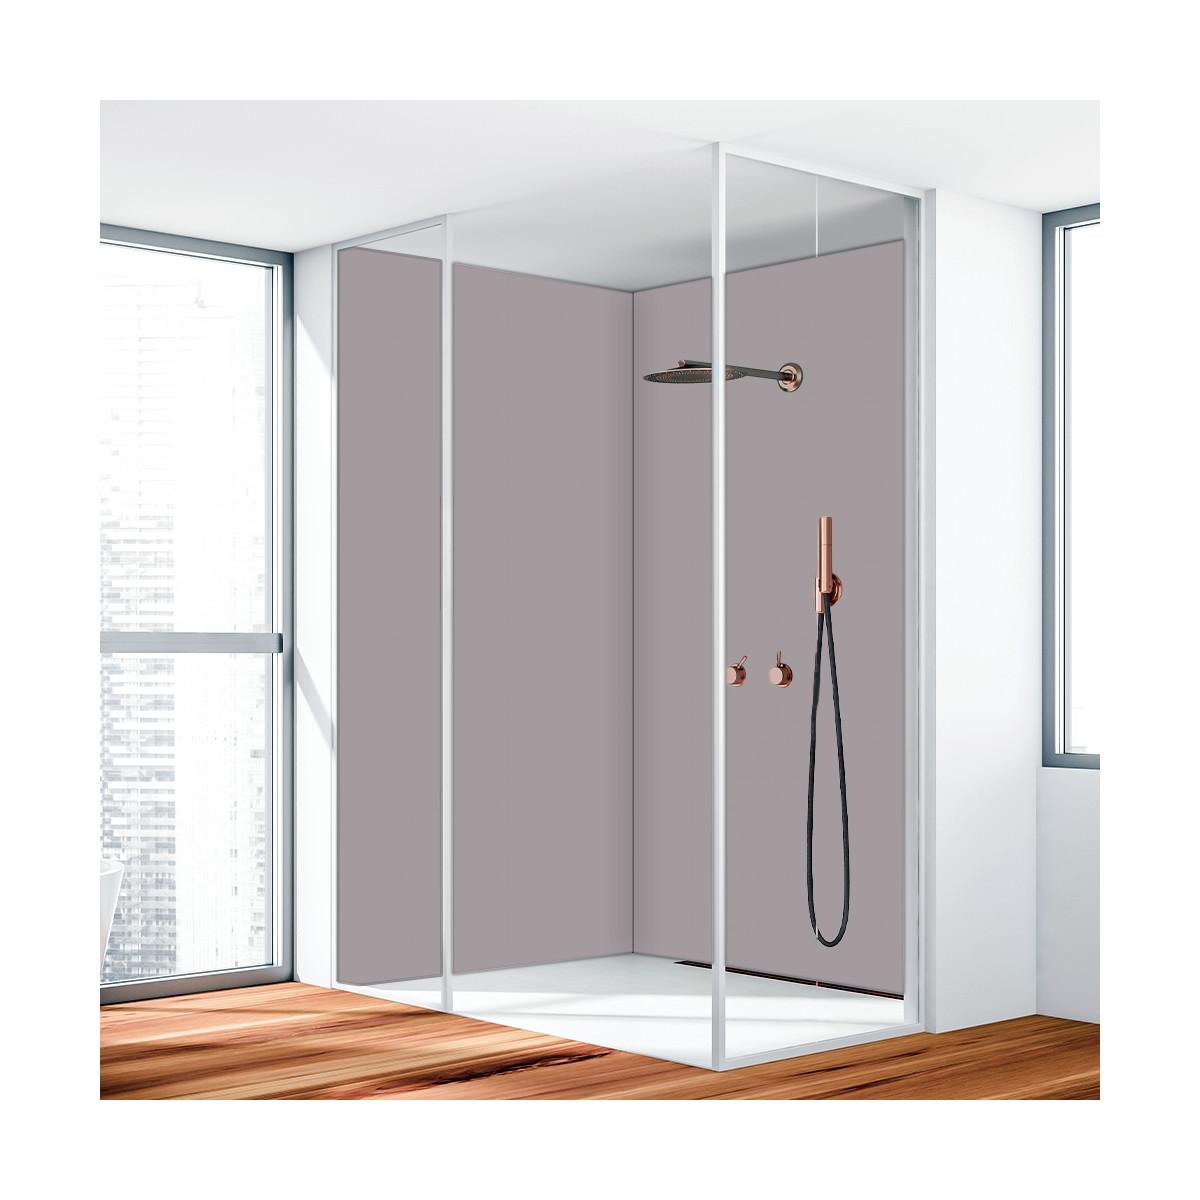 duschr ckwand aluverbund grau 7042 119 90. Black Bedroom Furniture Sets. Home Design Ideas